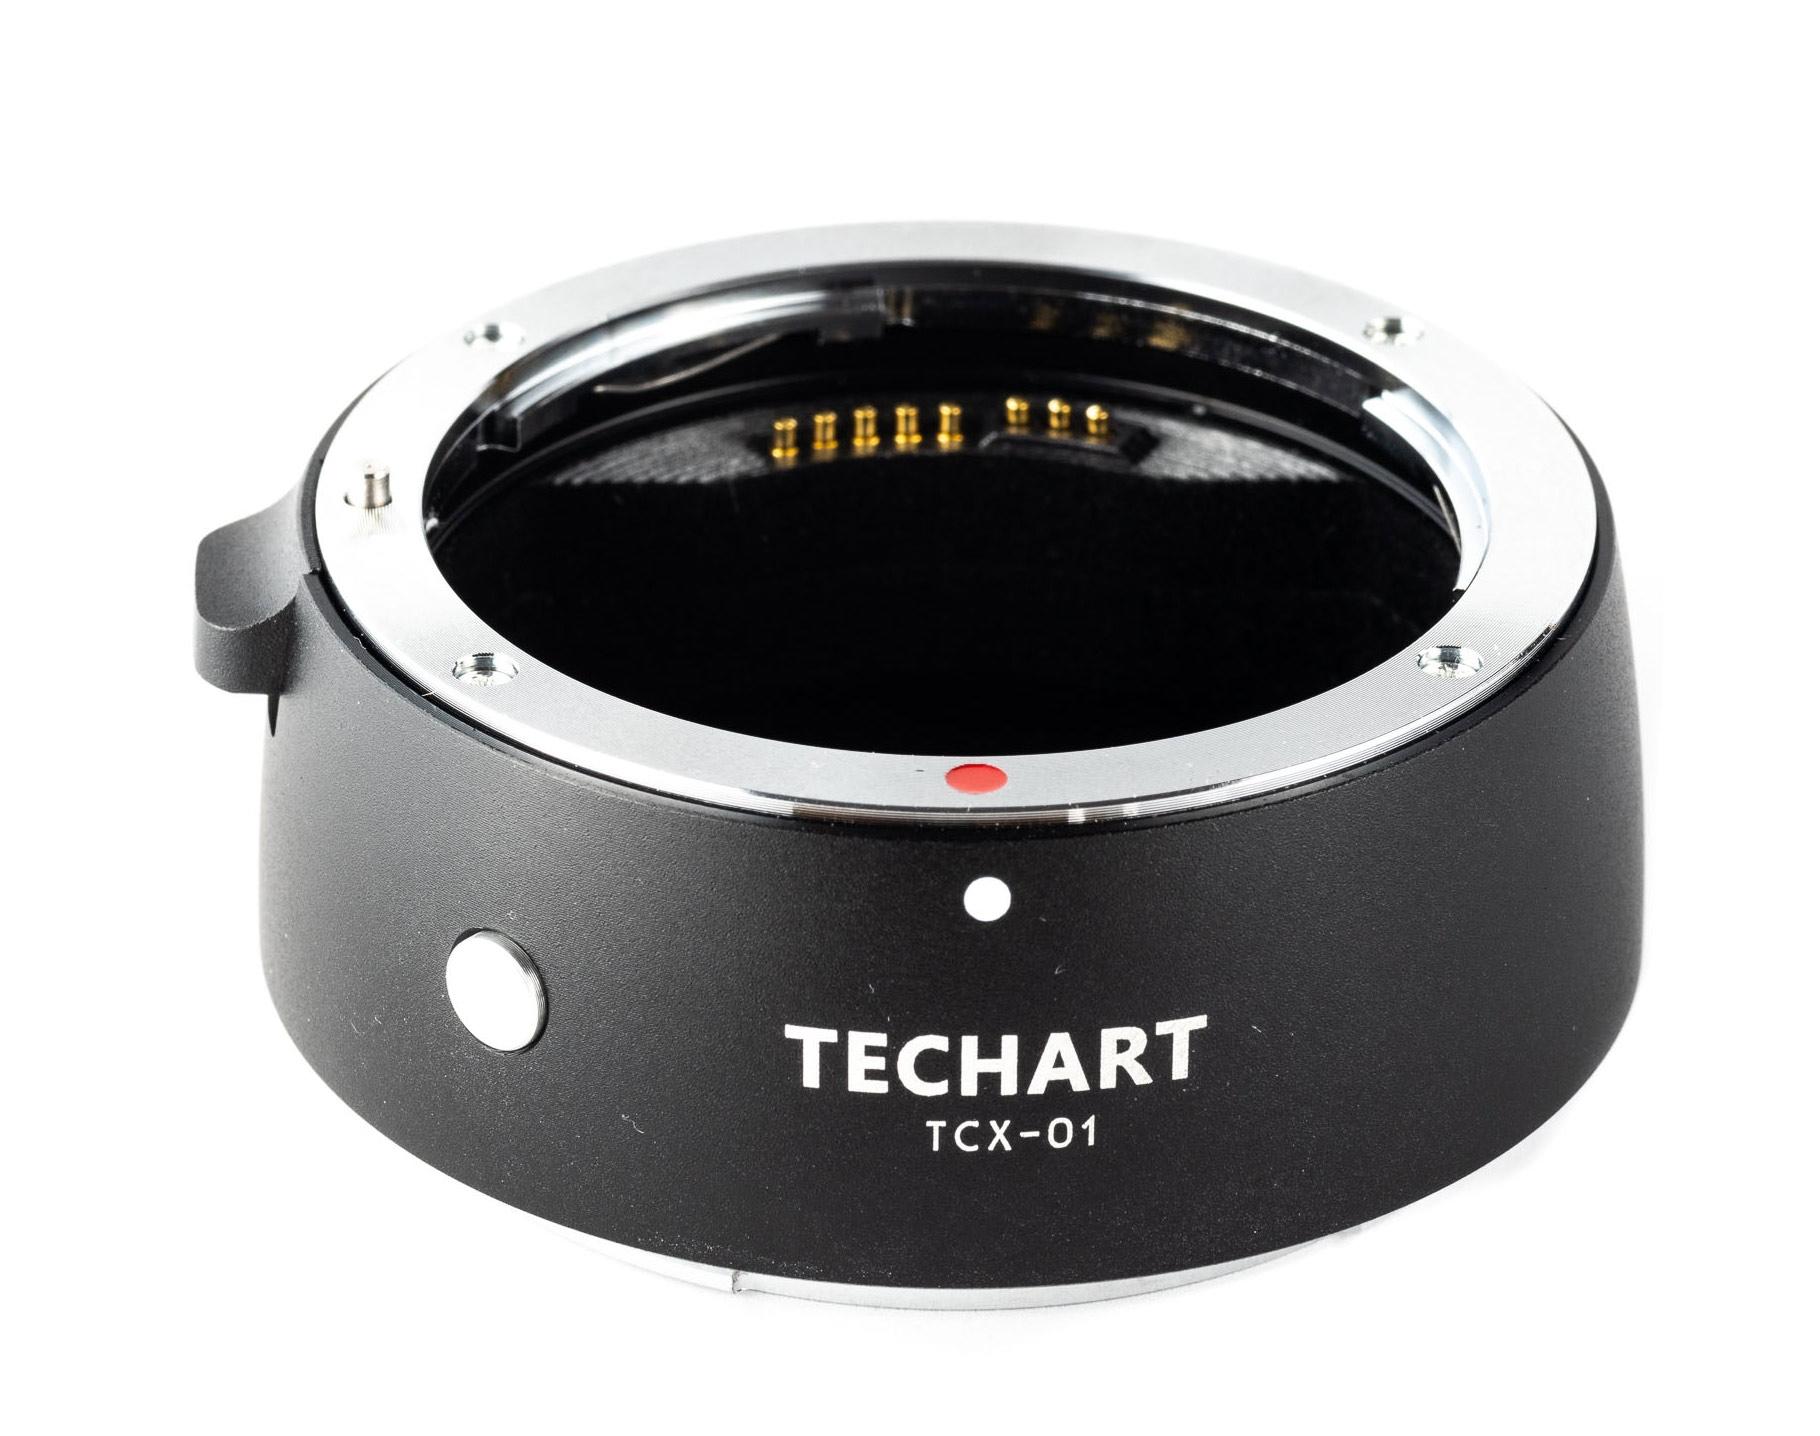 TECHART TCX-01 adaptér objektivu Canon EF na tělo Hasselblad X1D